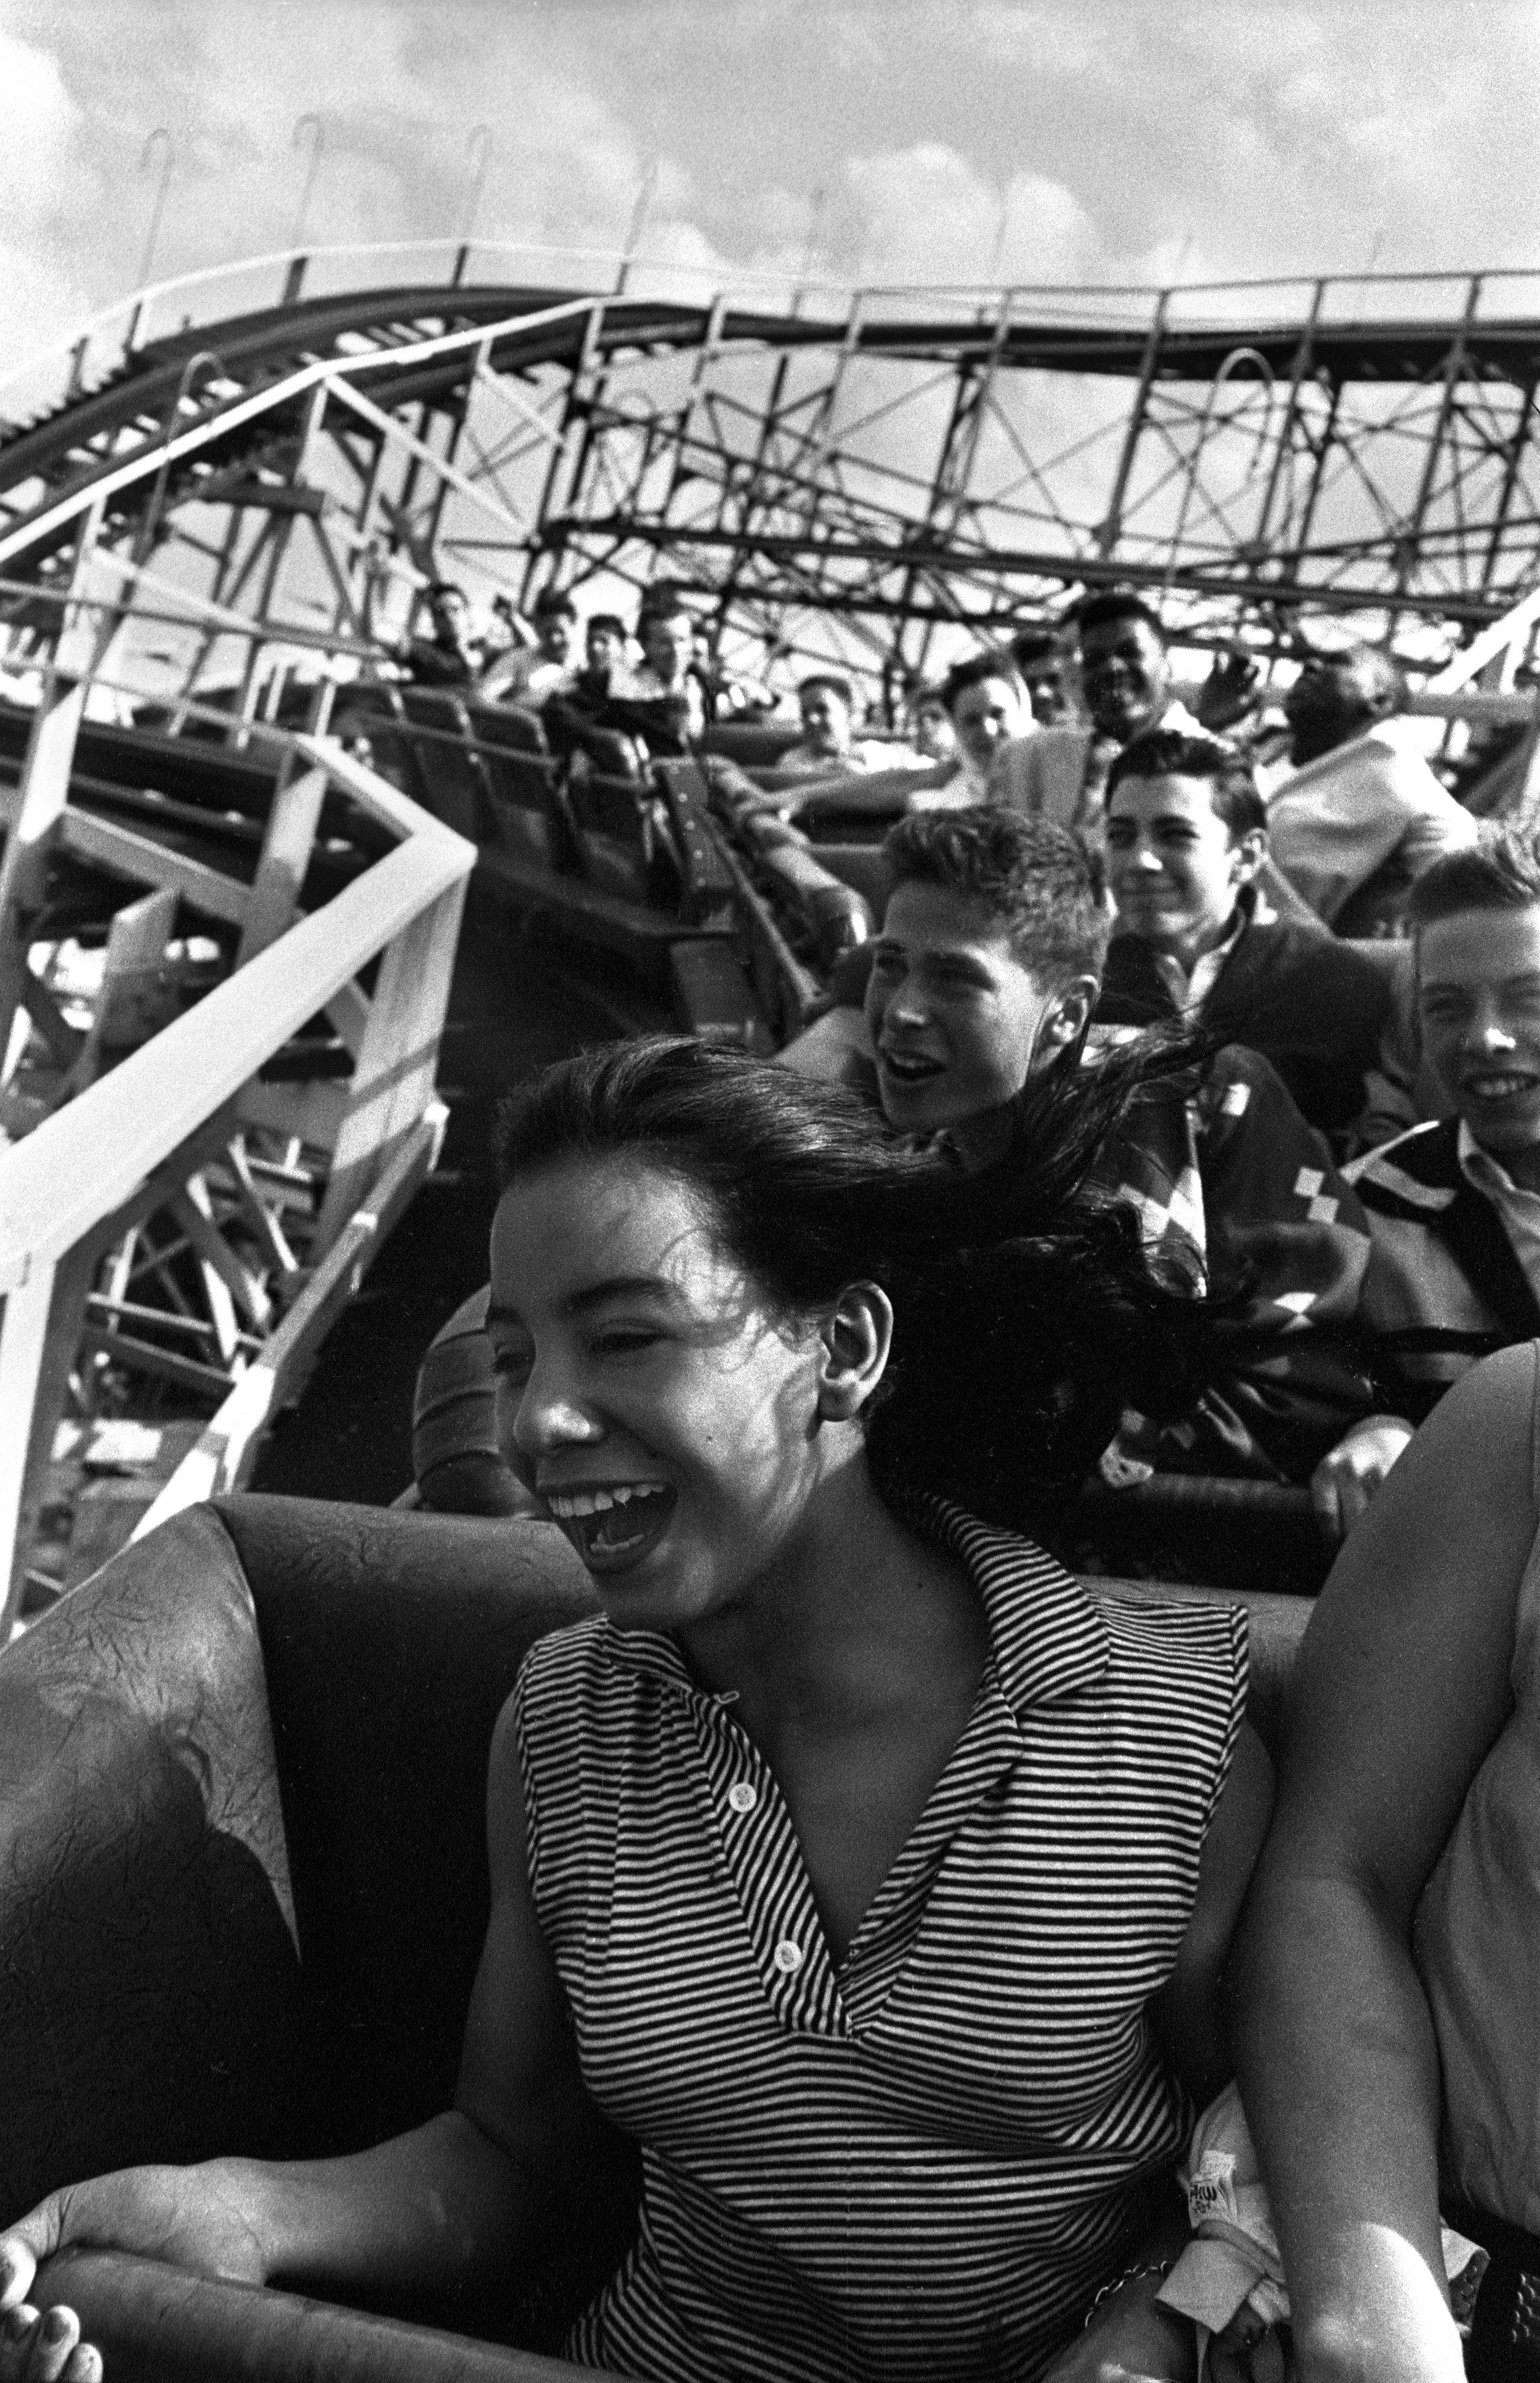 CI-035_Girl_on_Cyclone_Coney_Island_1950.jpg